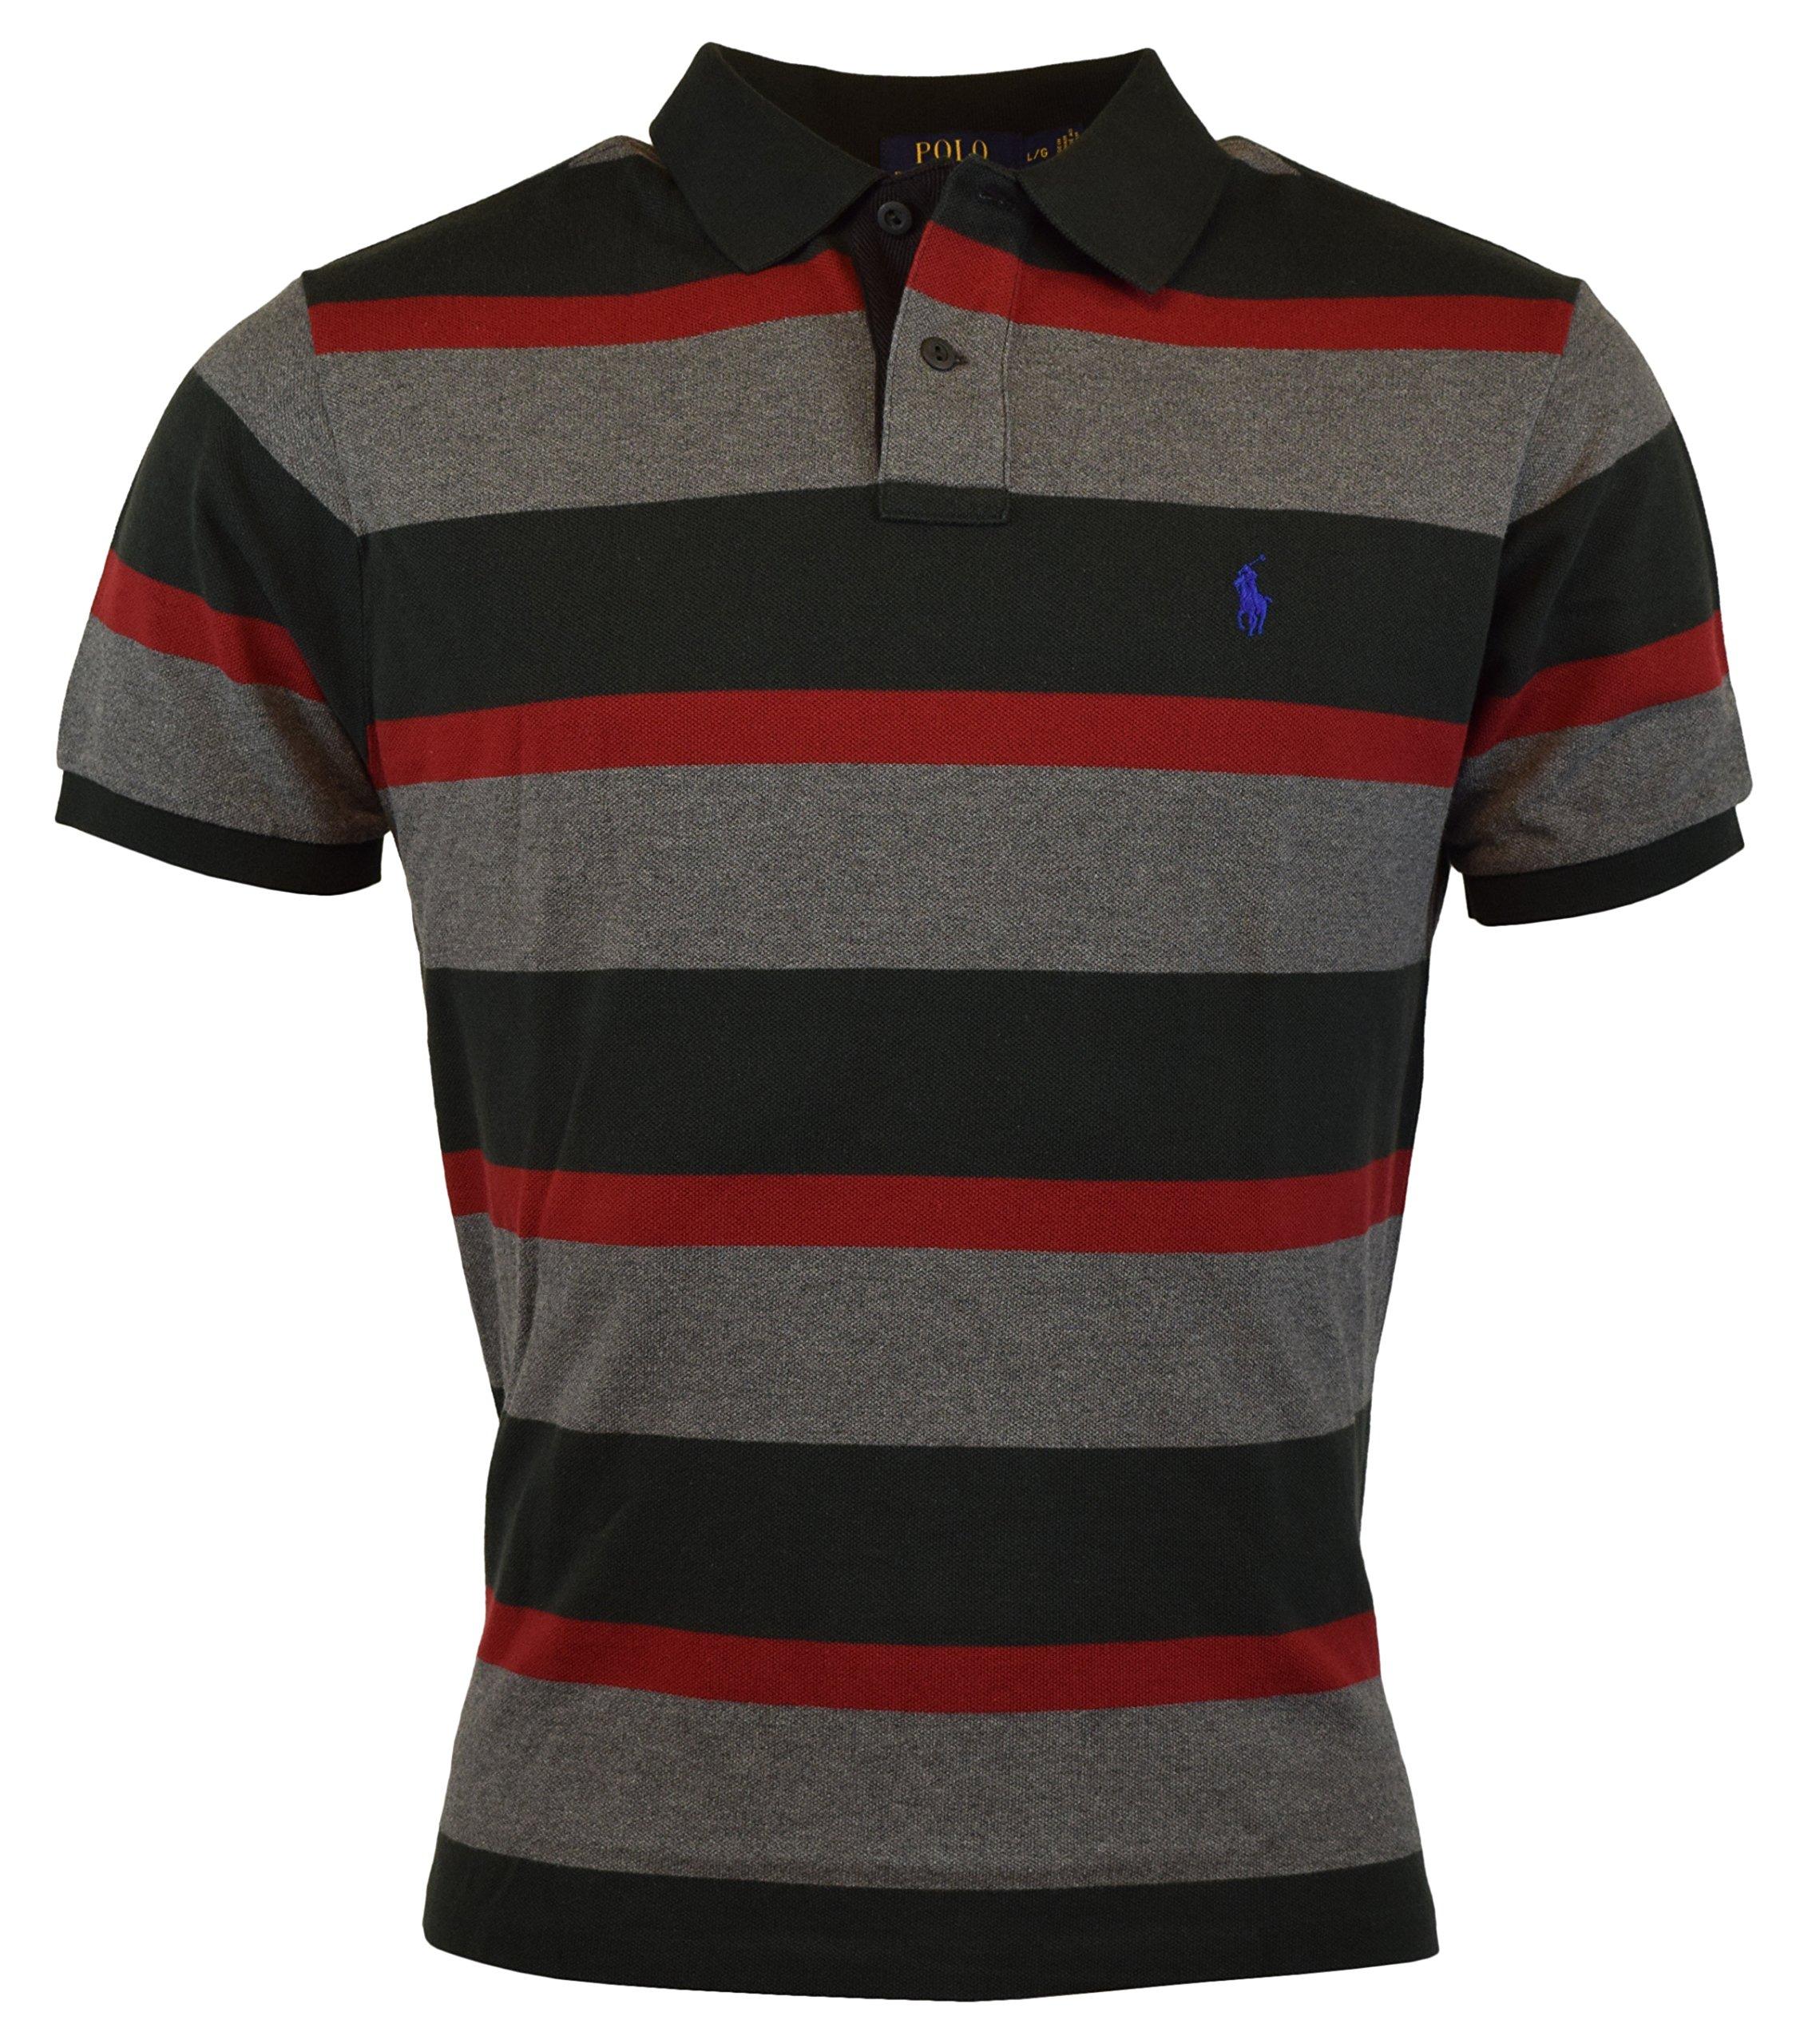 Polo Ralph Lauren Mens Custom Fit Mesh Striped Polo Shirt - XS - Boot Black